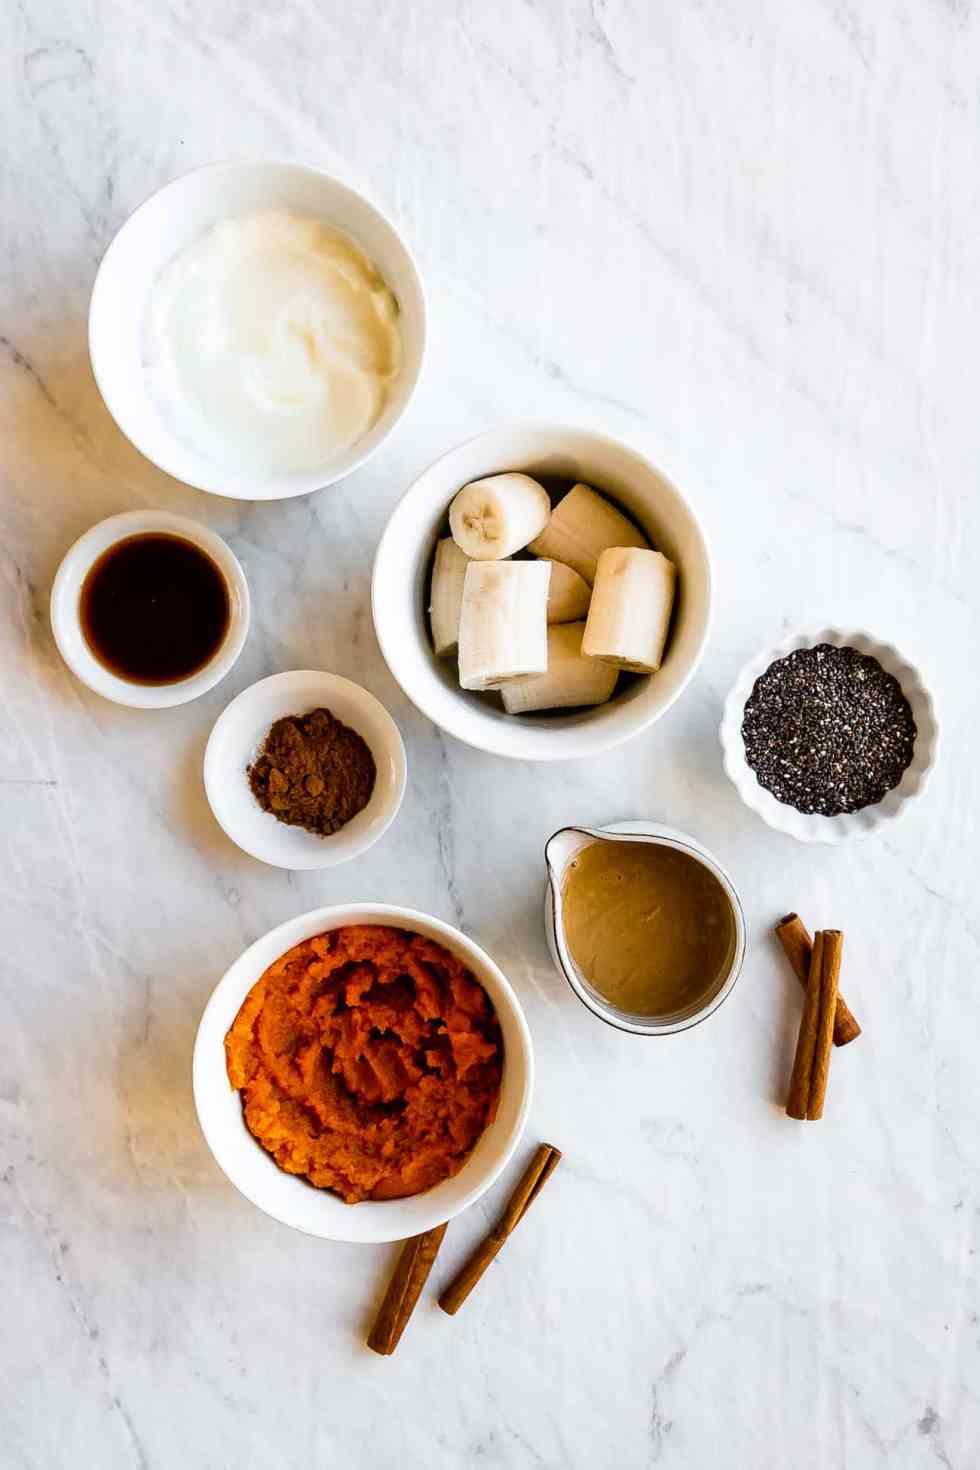 ingredients in bowls to make pumpkin smoothie